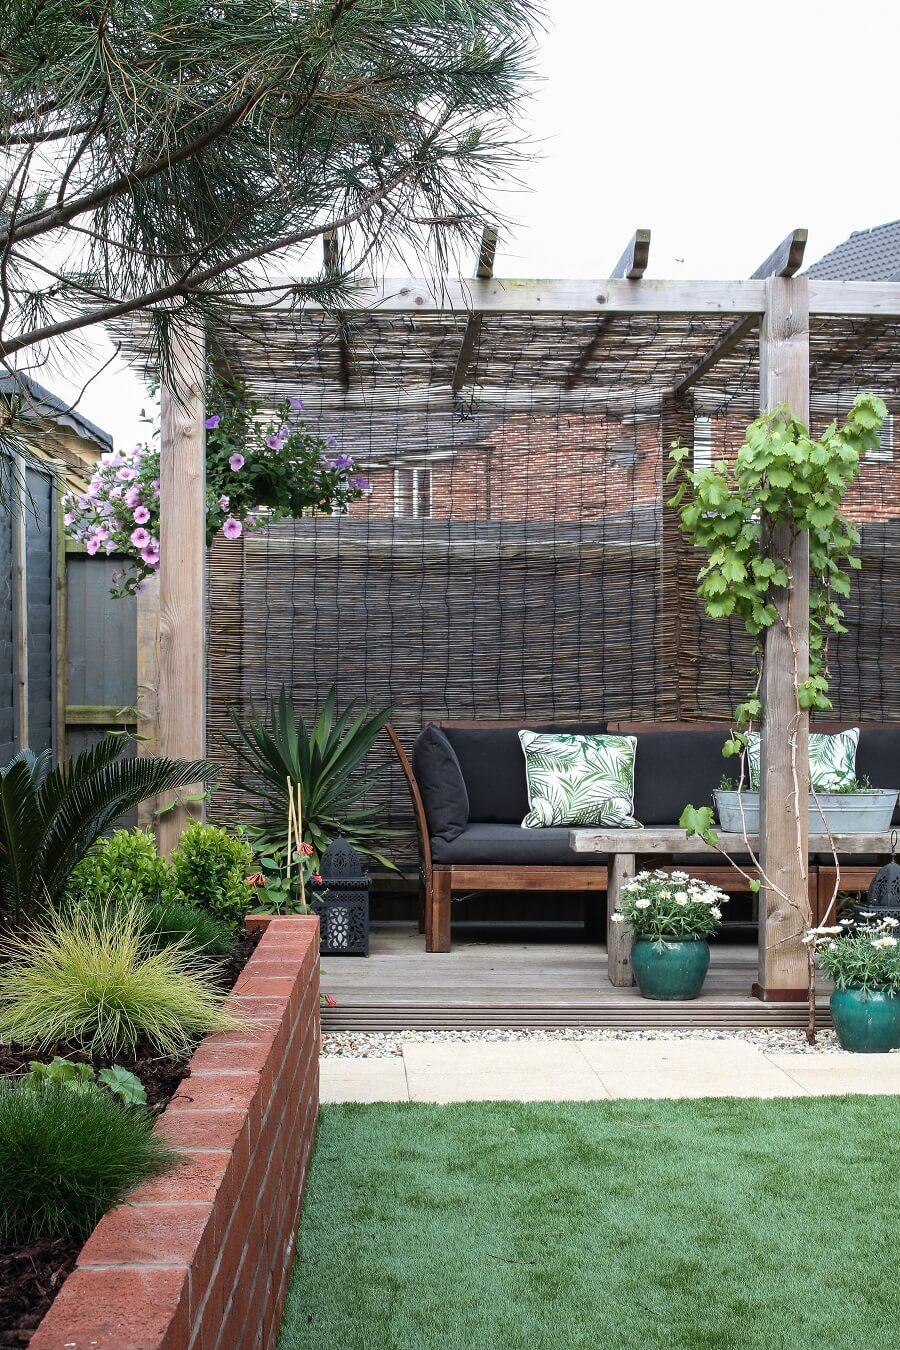 Intimate Pergola and Raised Garden Bed